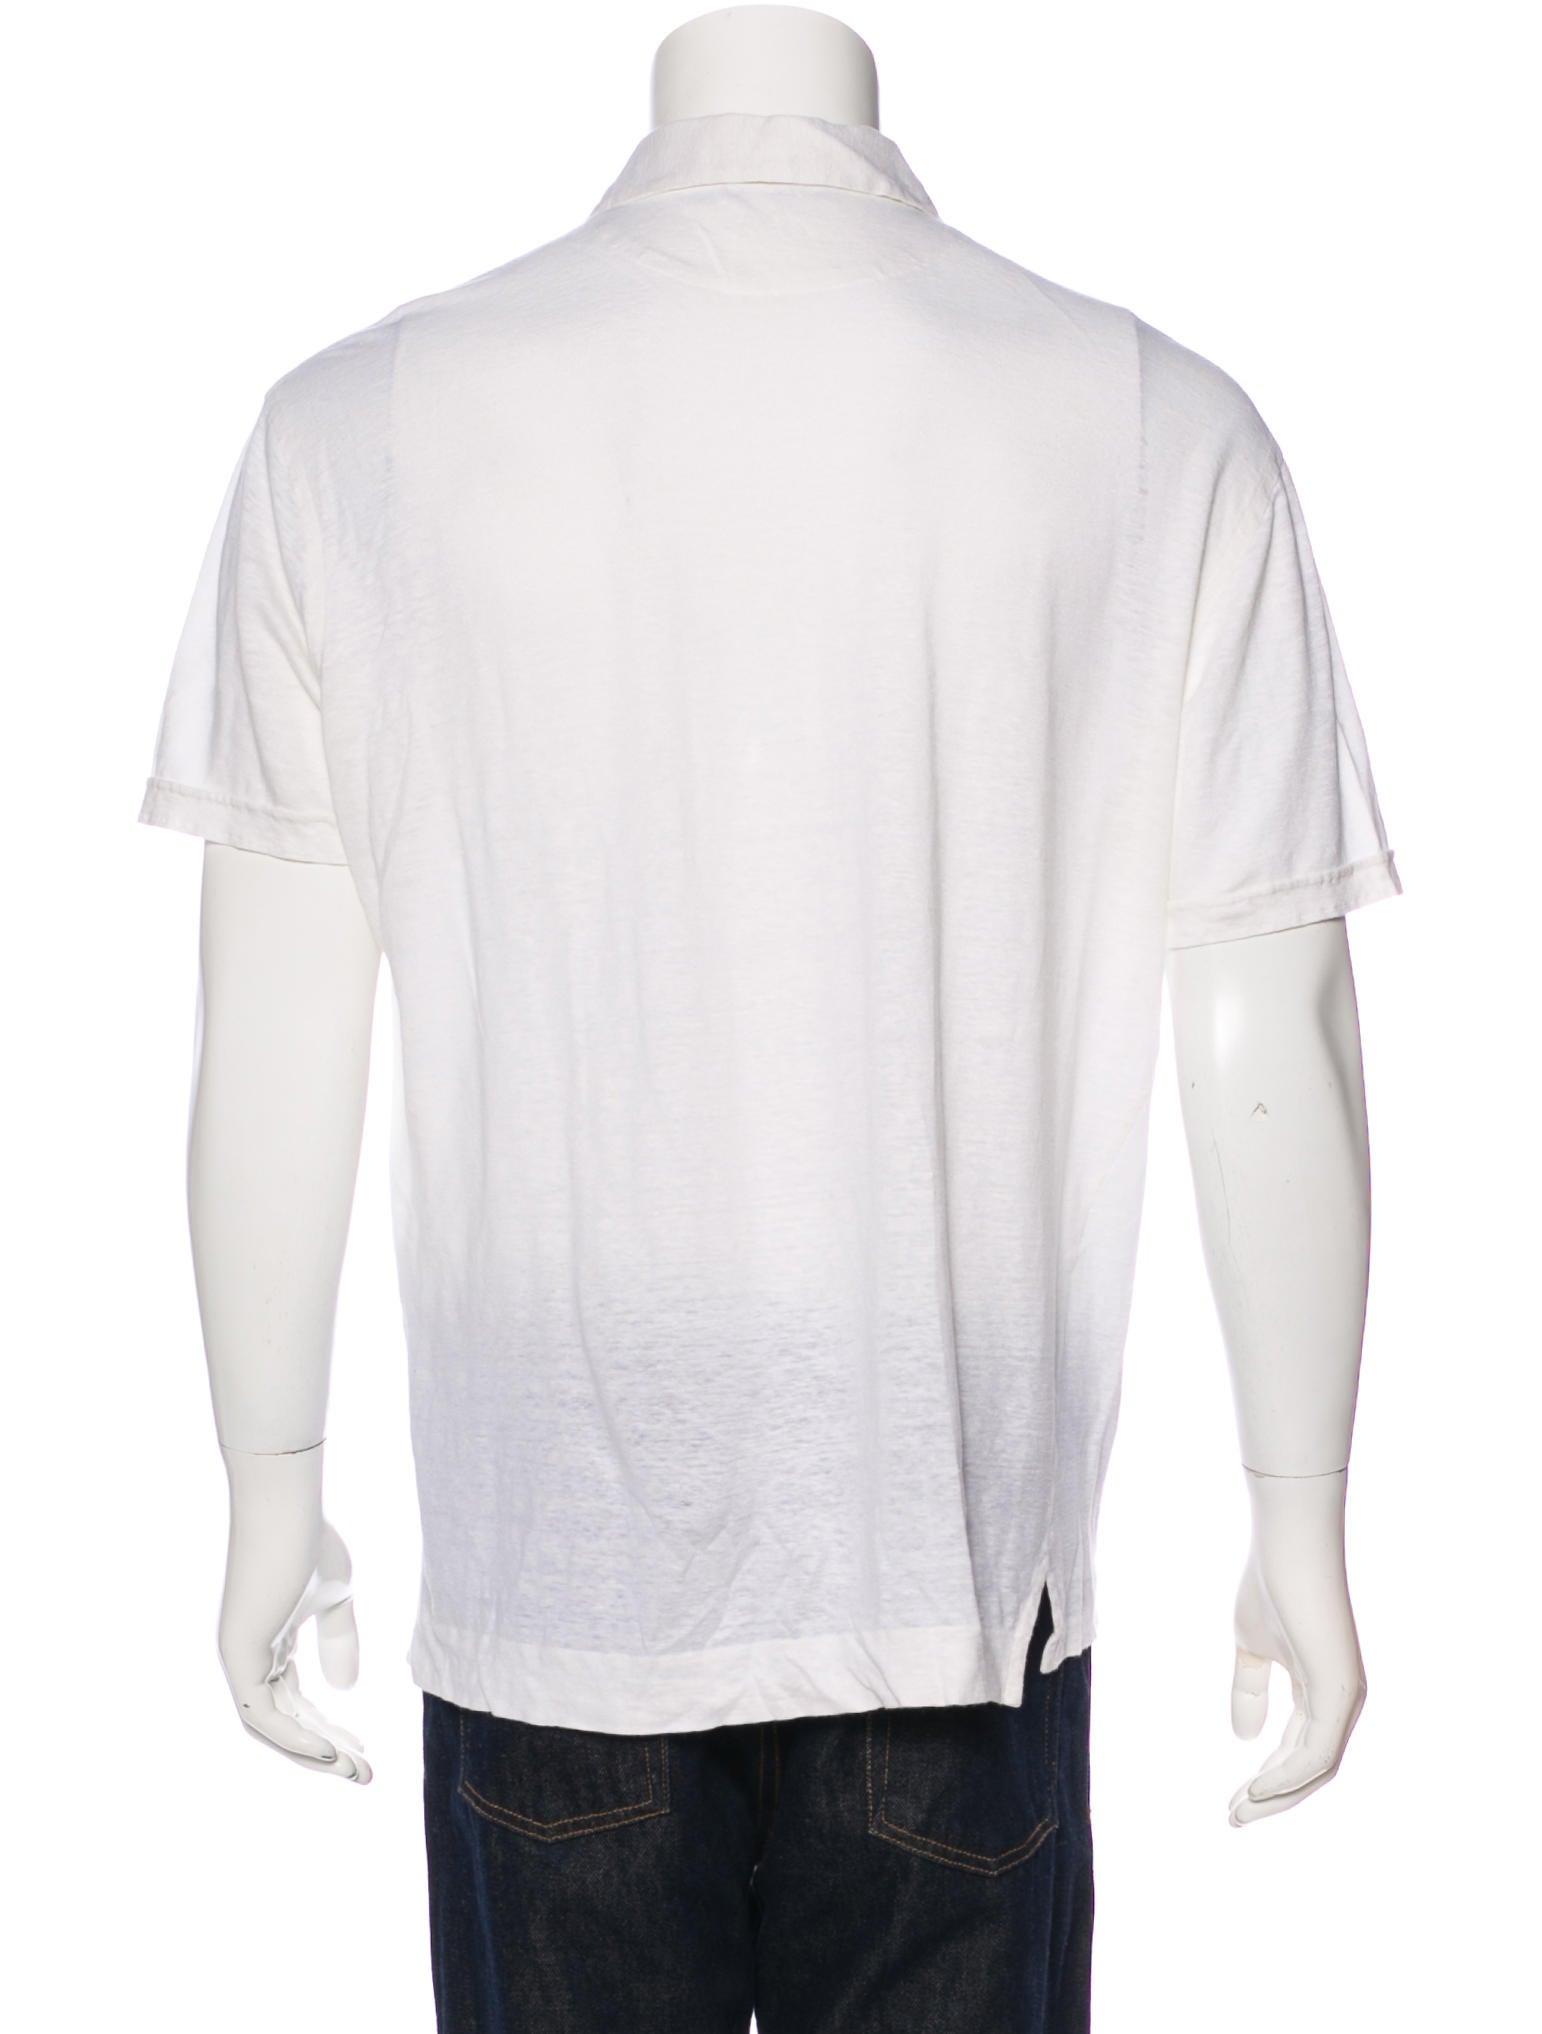 Ermenegildo zegna linen polo shirt clothing zgn25690 for Zegna polo shirts sale